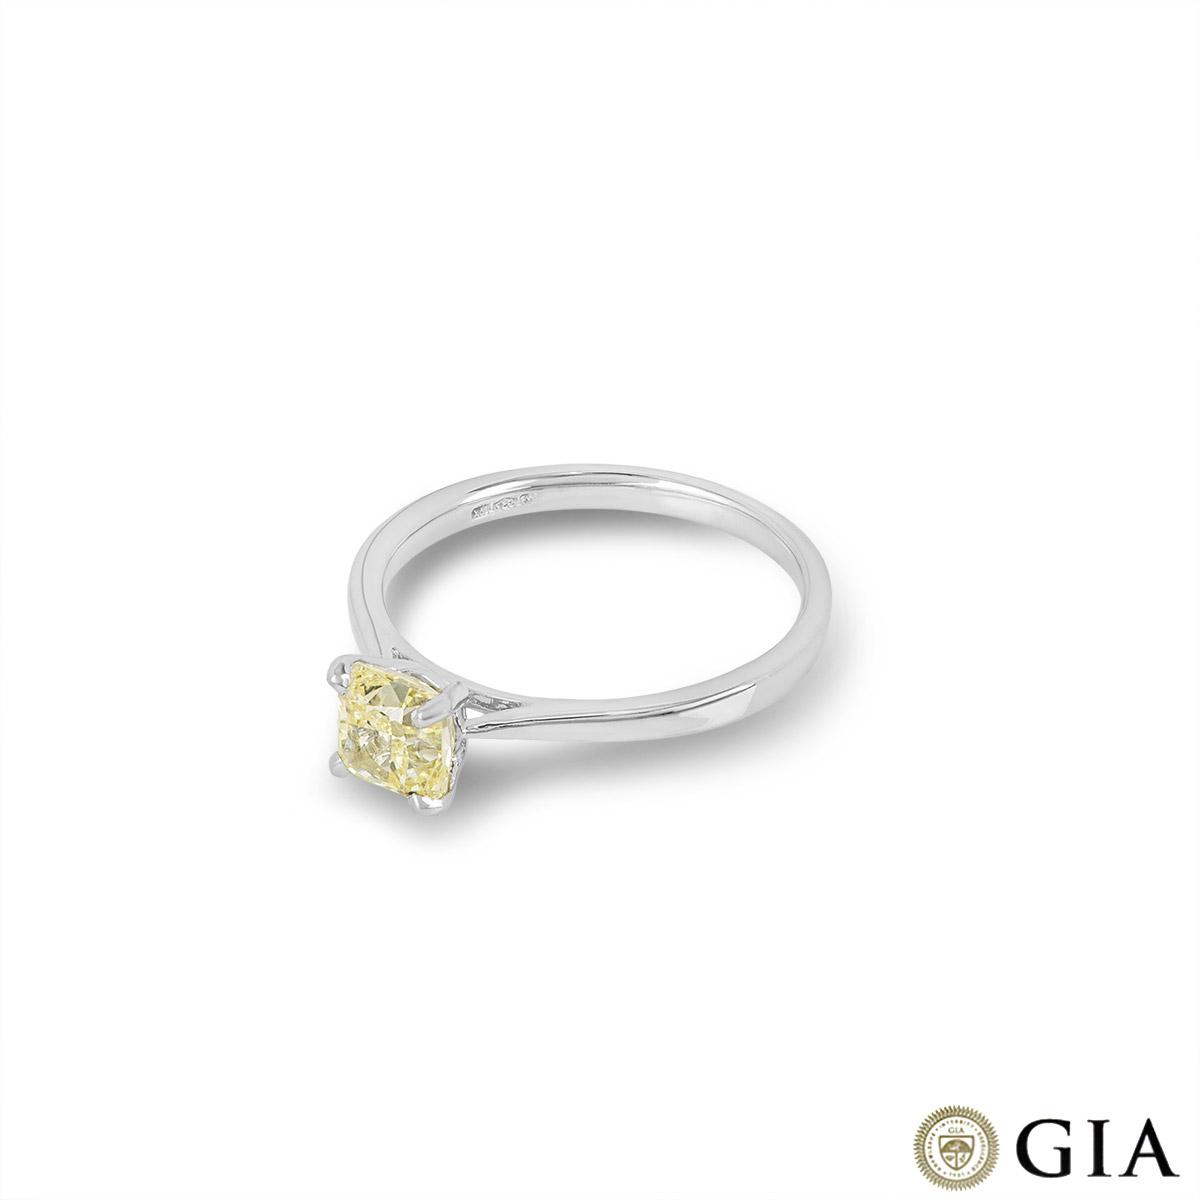 Cushion Cut Platinum Fancy Yellow Diamond Ring 1.03ct